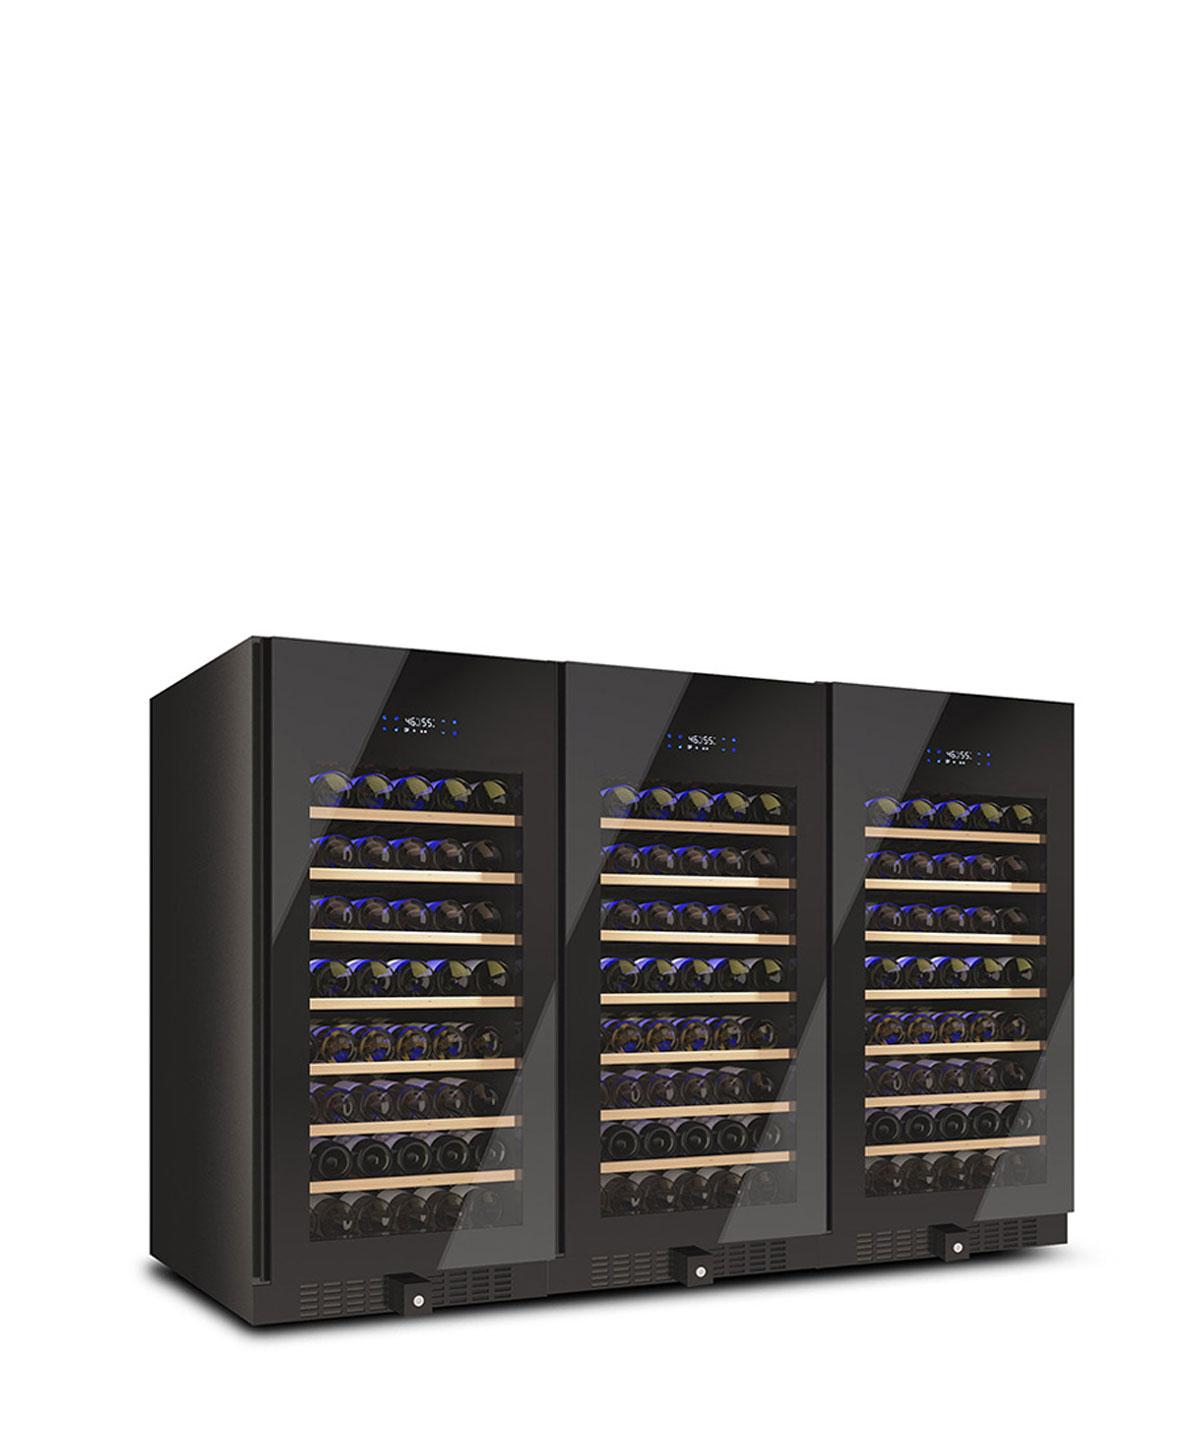 Armadio cantina linea Luxury 288 bottiglie Altamente Professionale